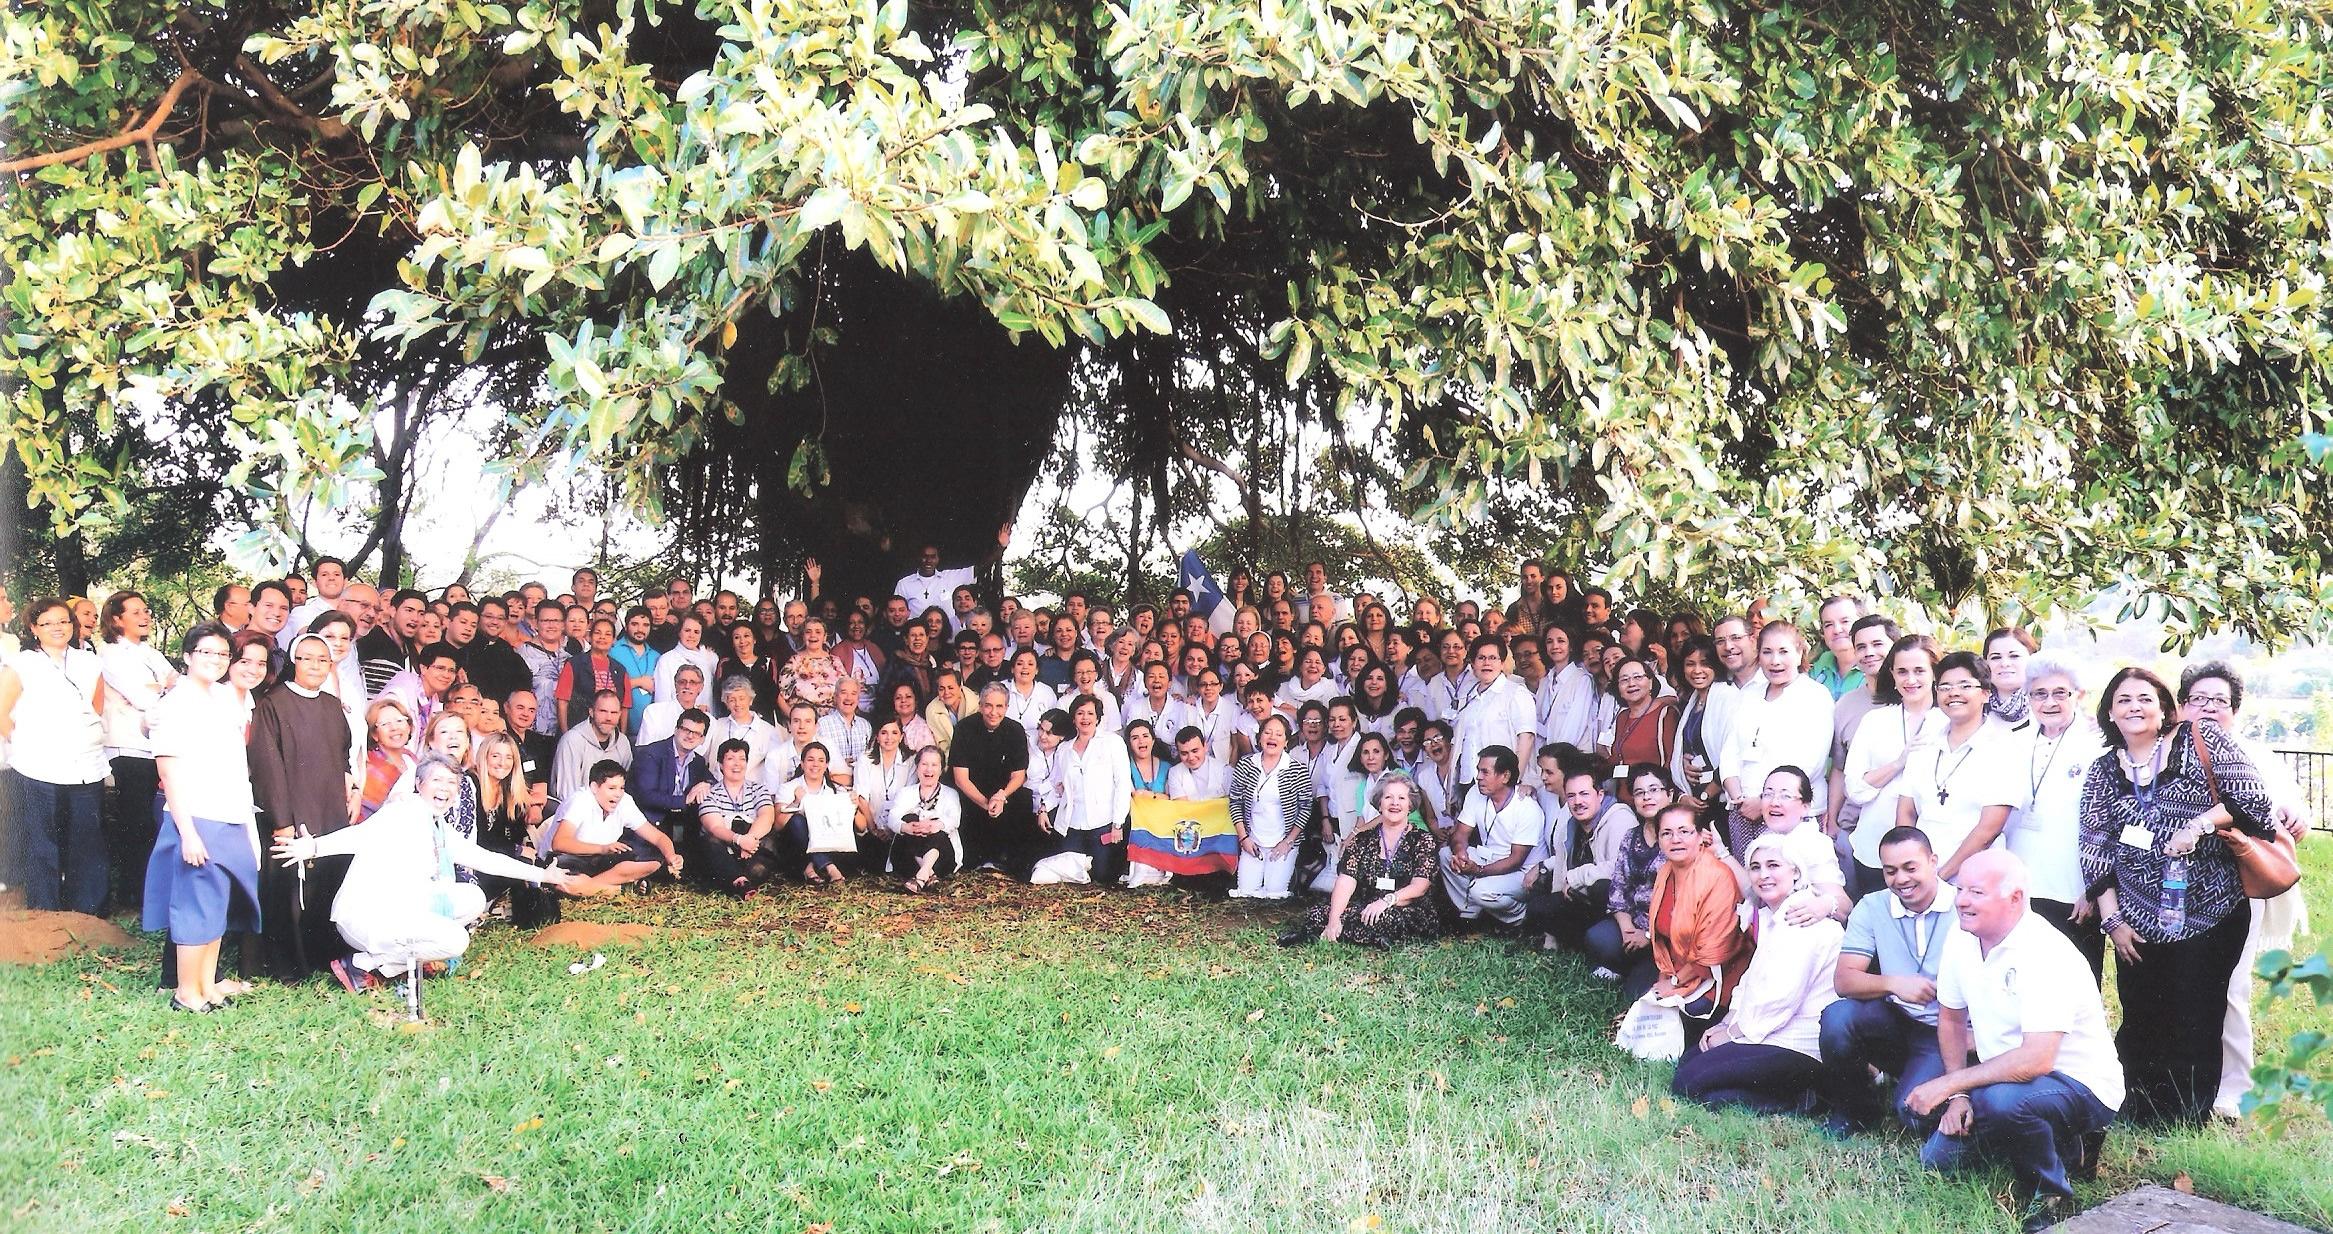 congreso internacional 2015